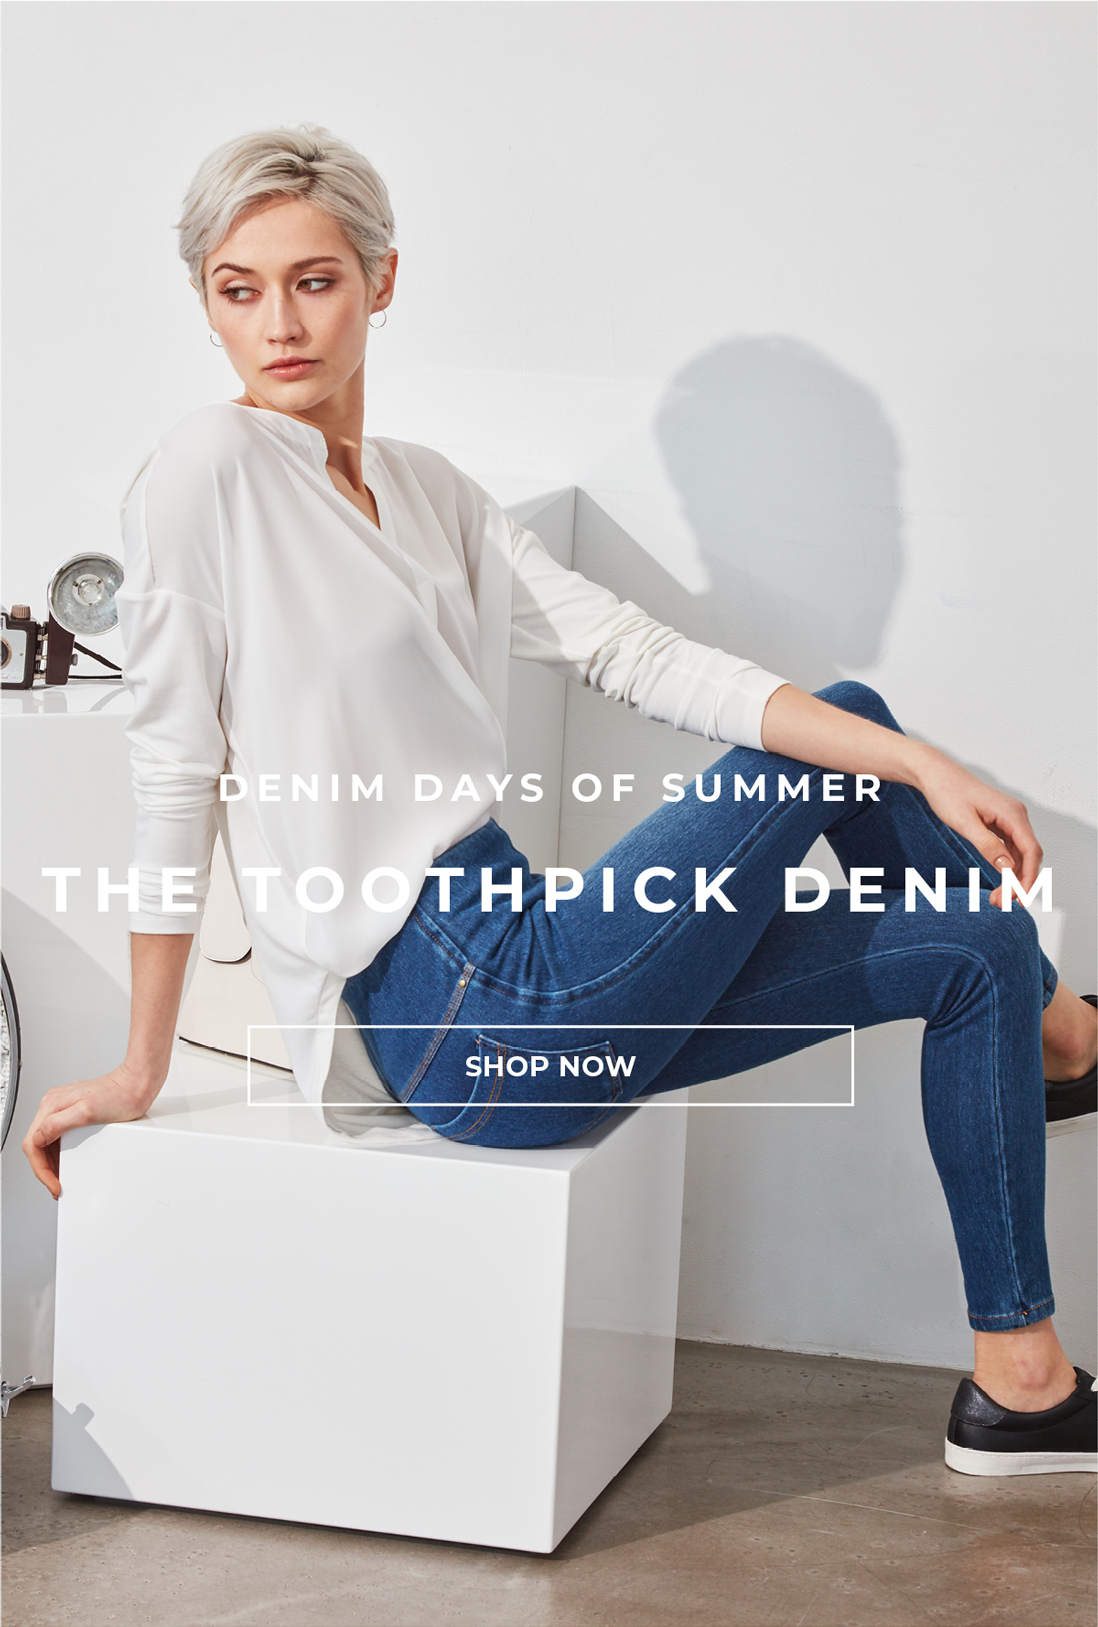 denim days of summer - The Toothpick Denim